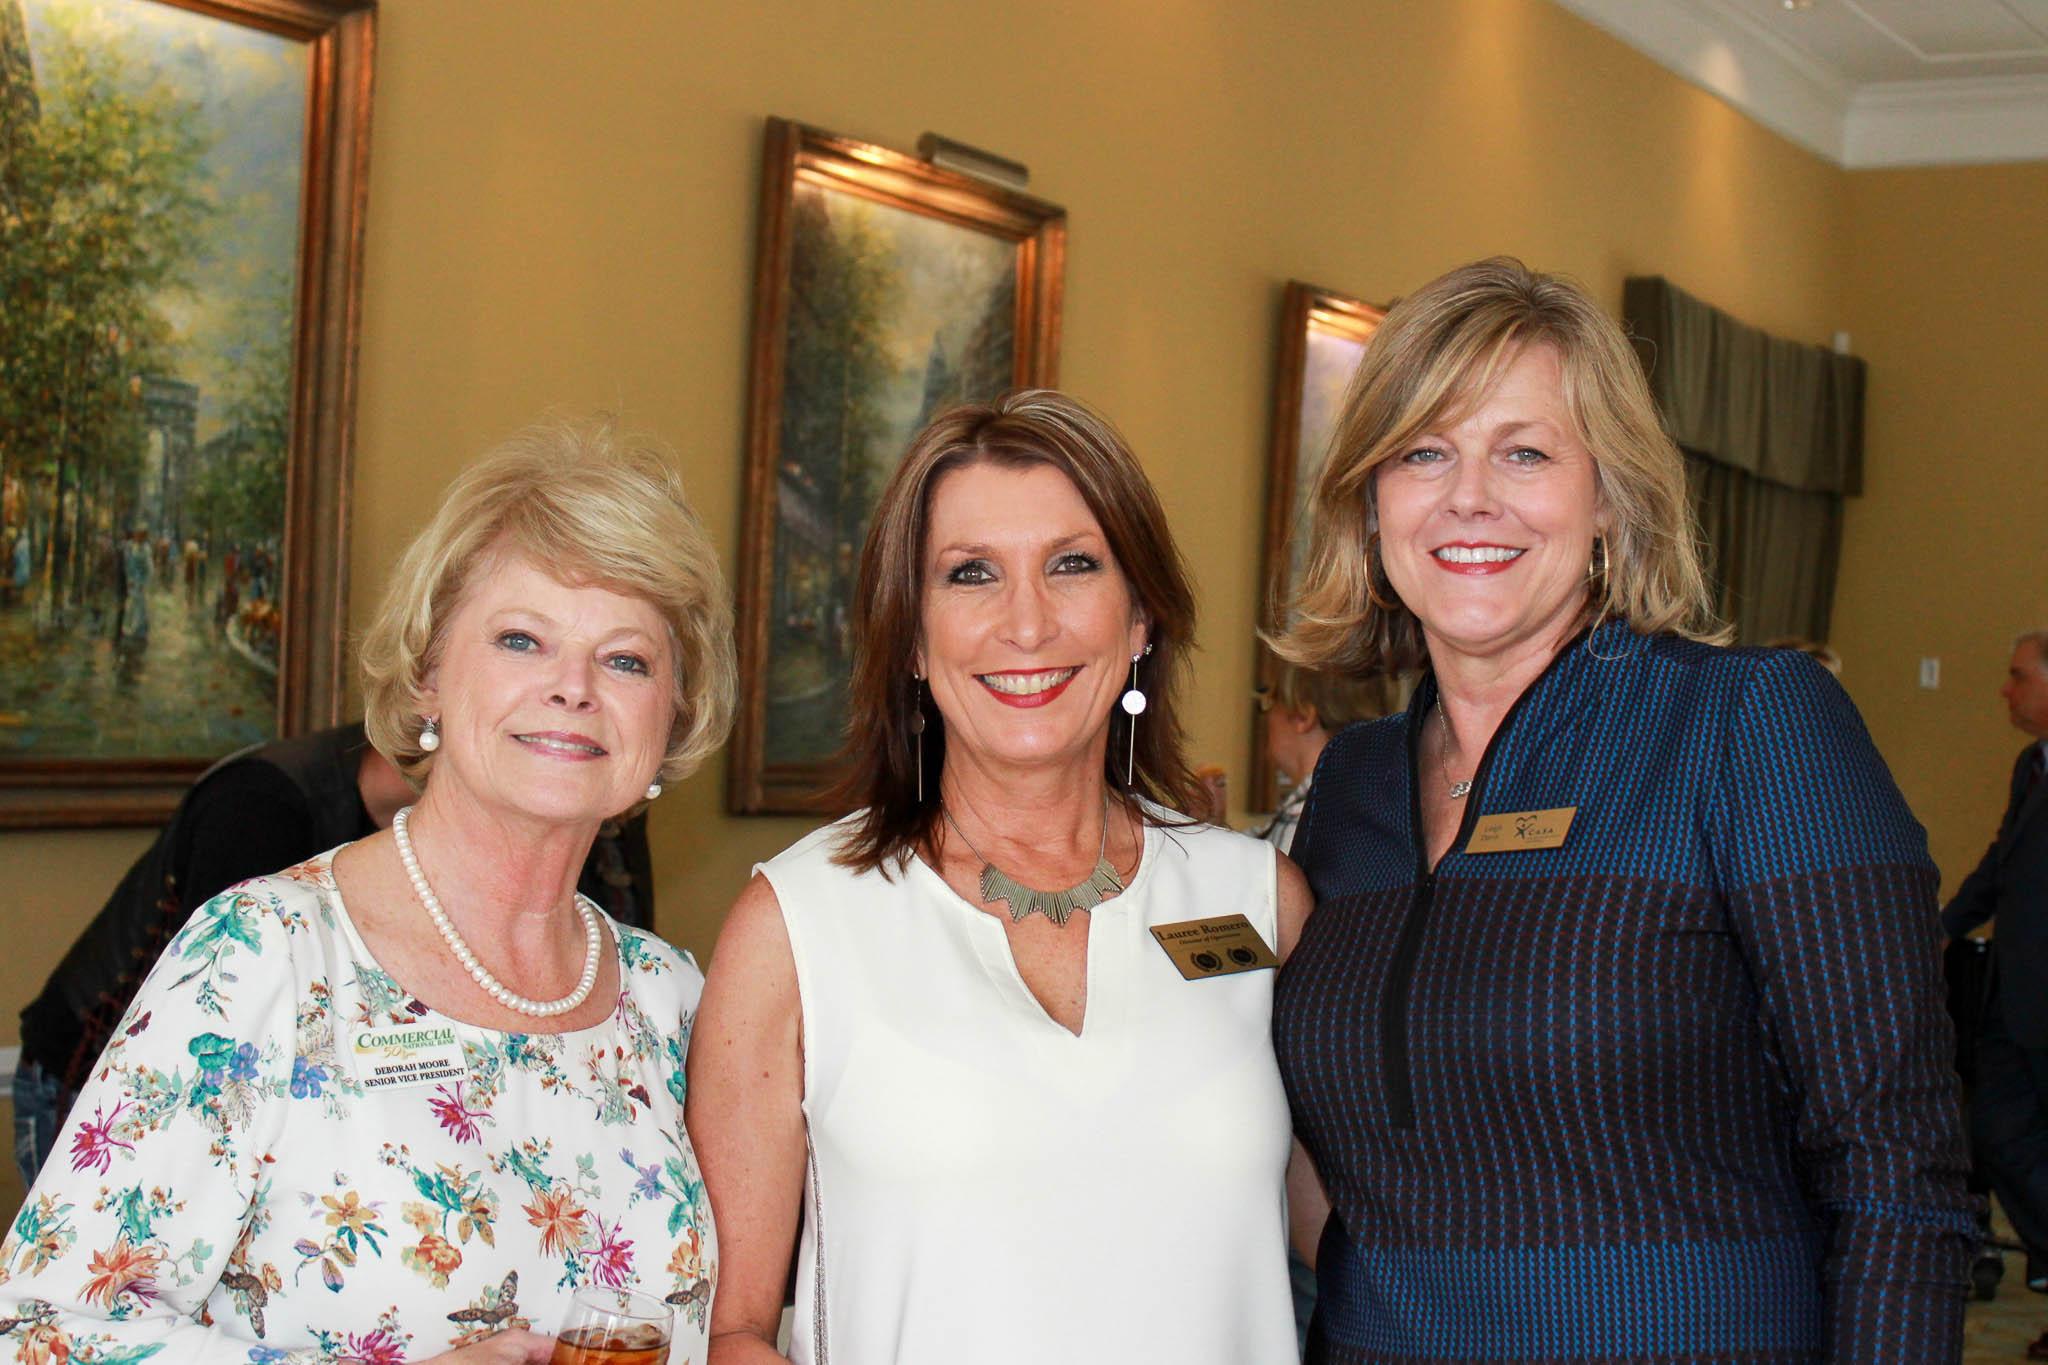 Debra Moore, Lauree Romero and Leigh Davis